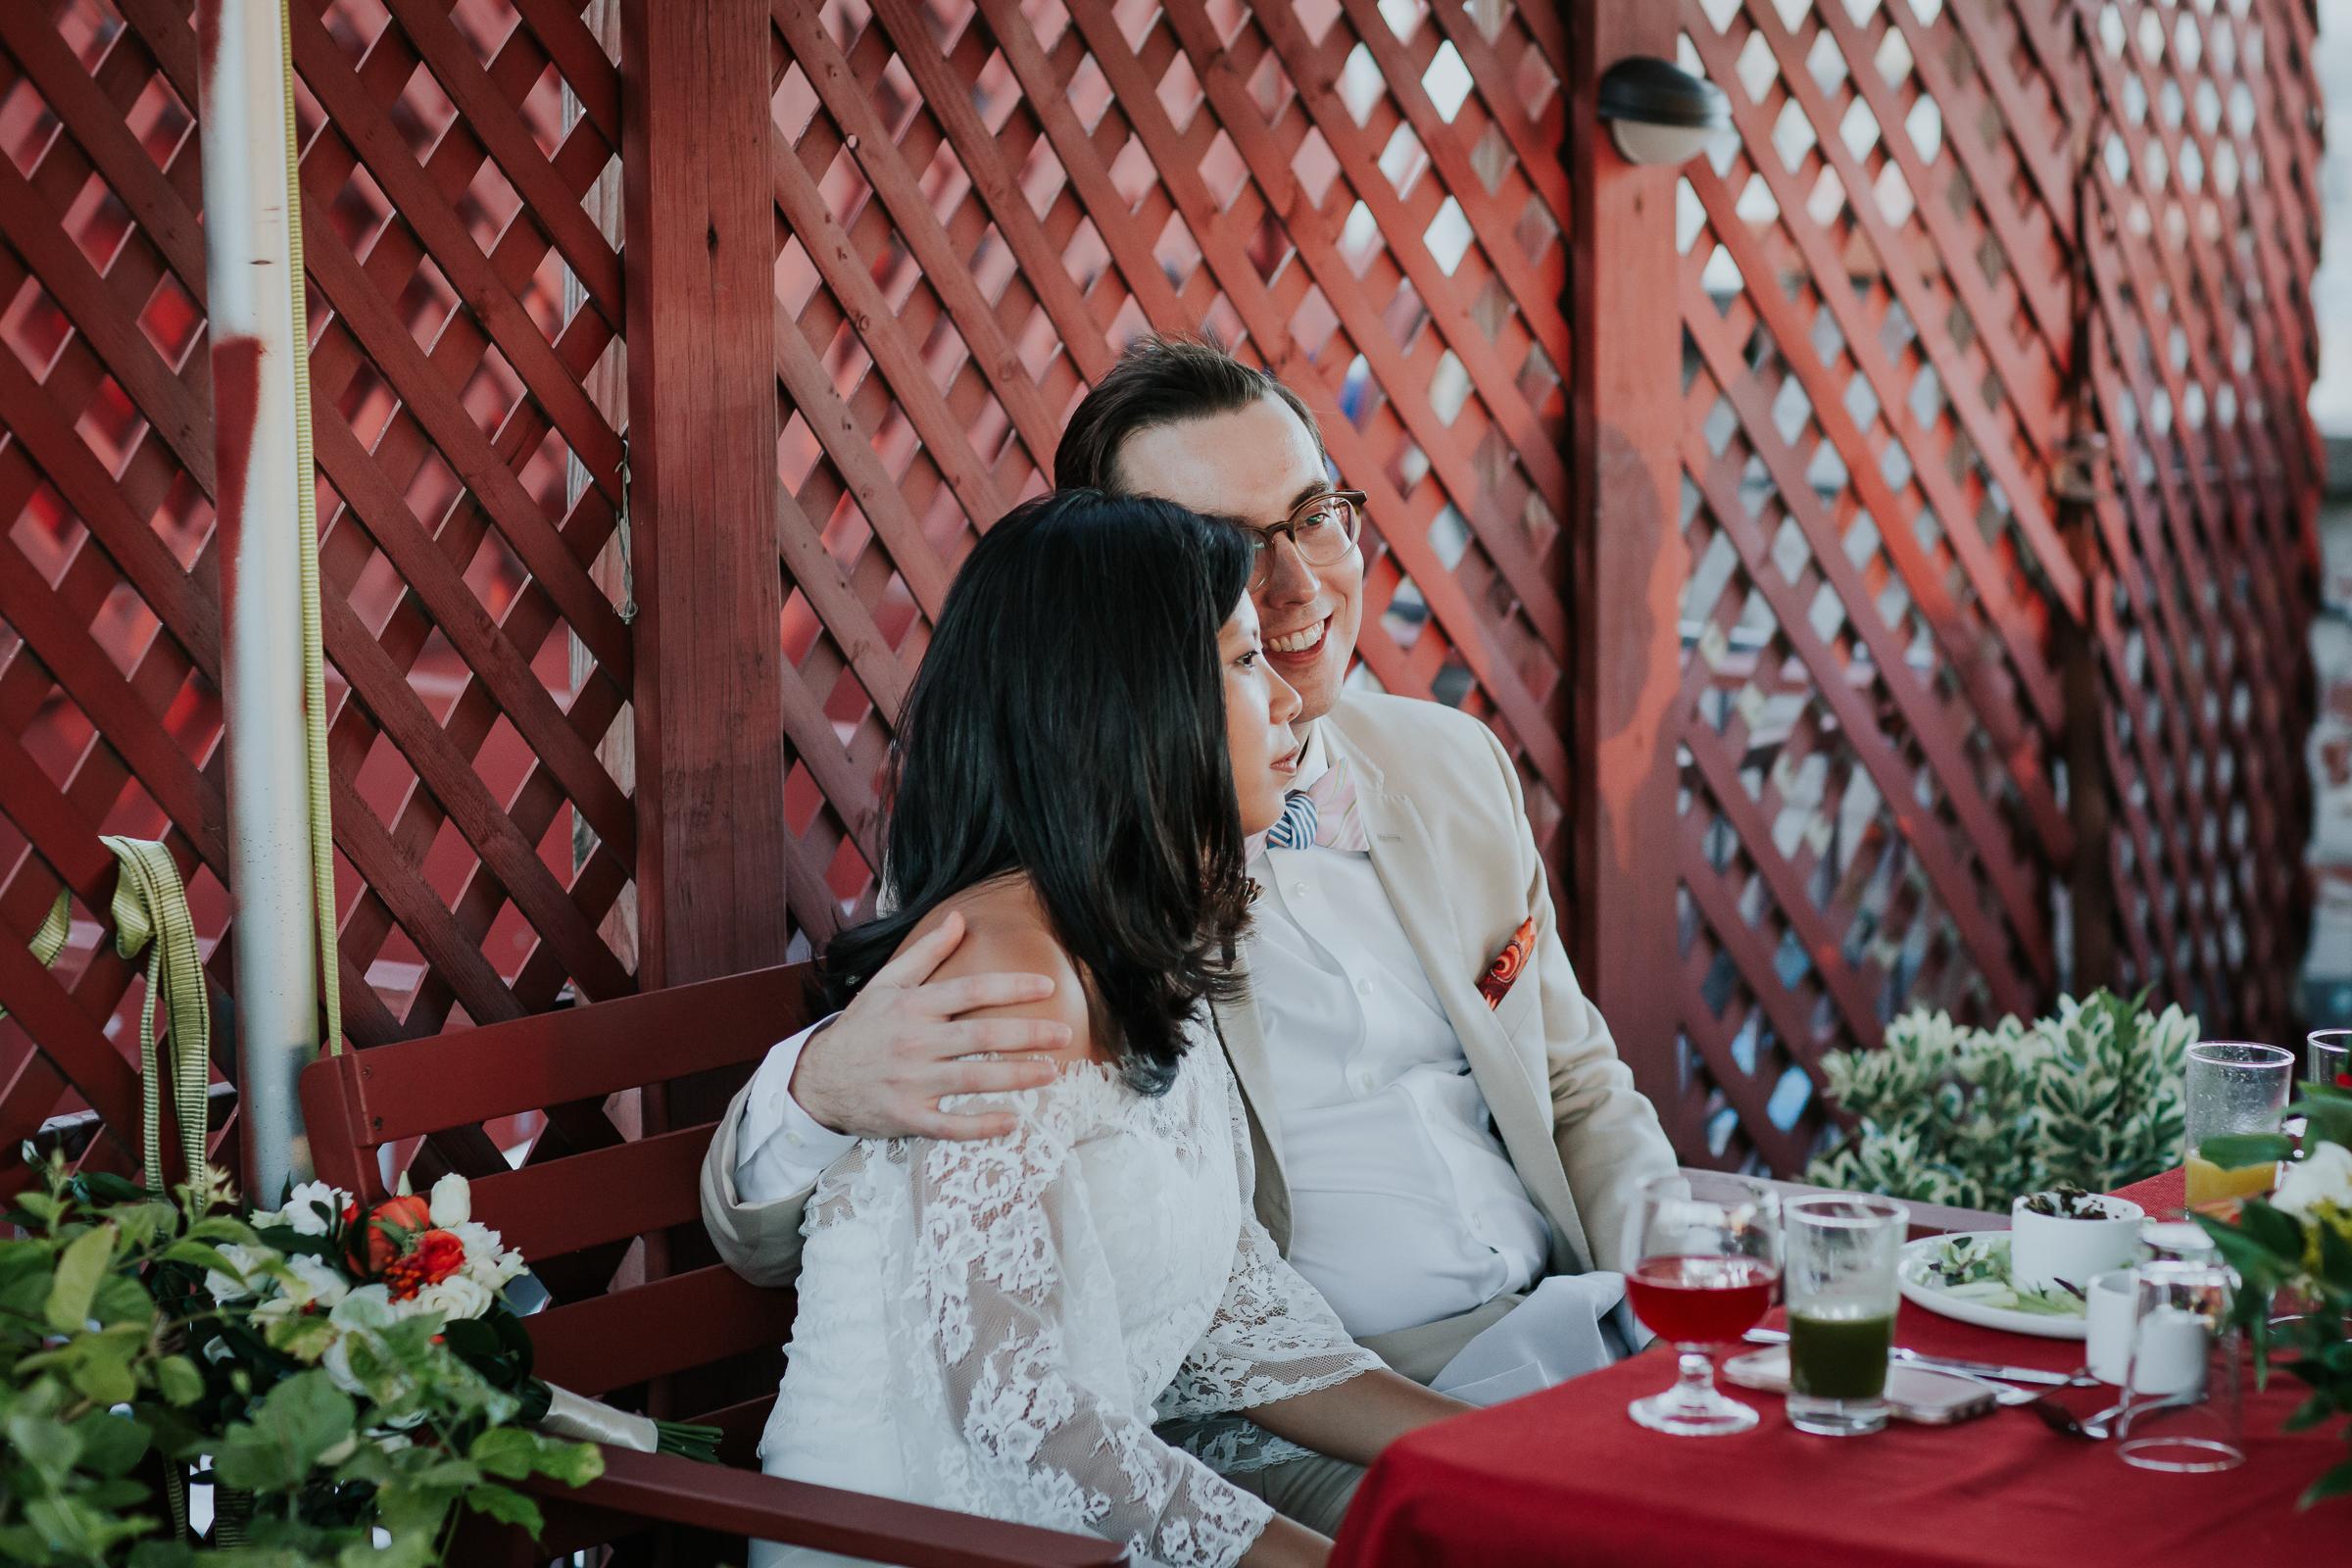 The-Bhakti-Center-Yoga-NYC-Rooftop-Documentary-Wedding-Photographer-53.jpg